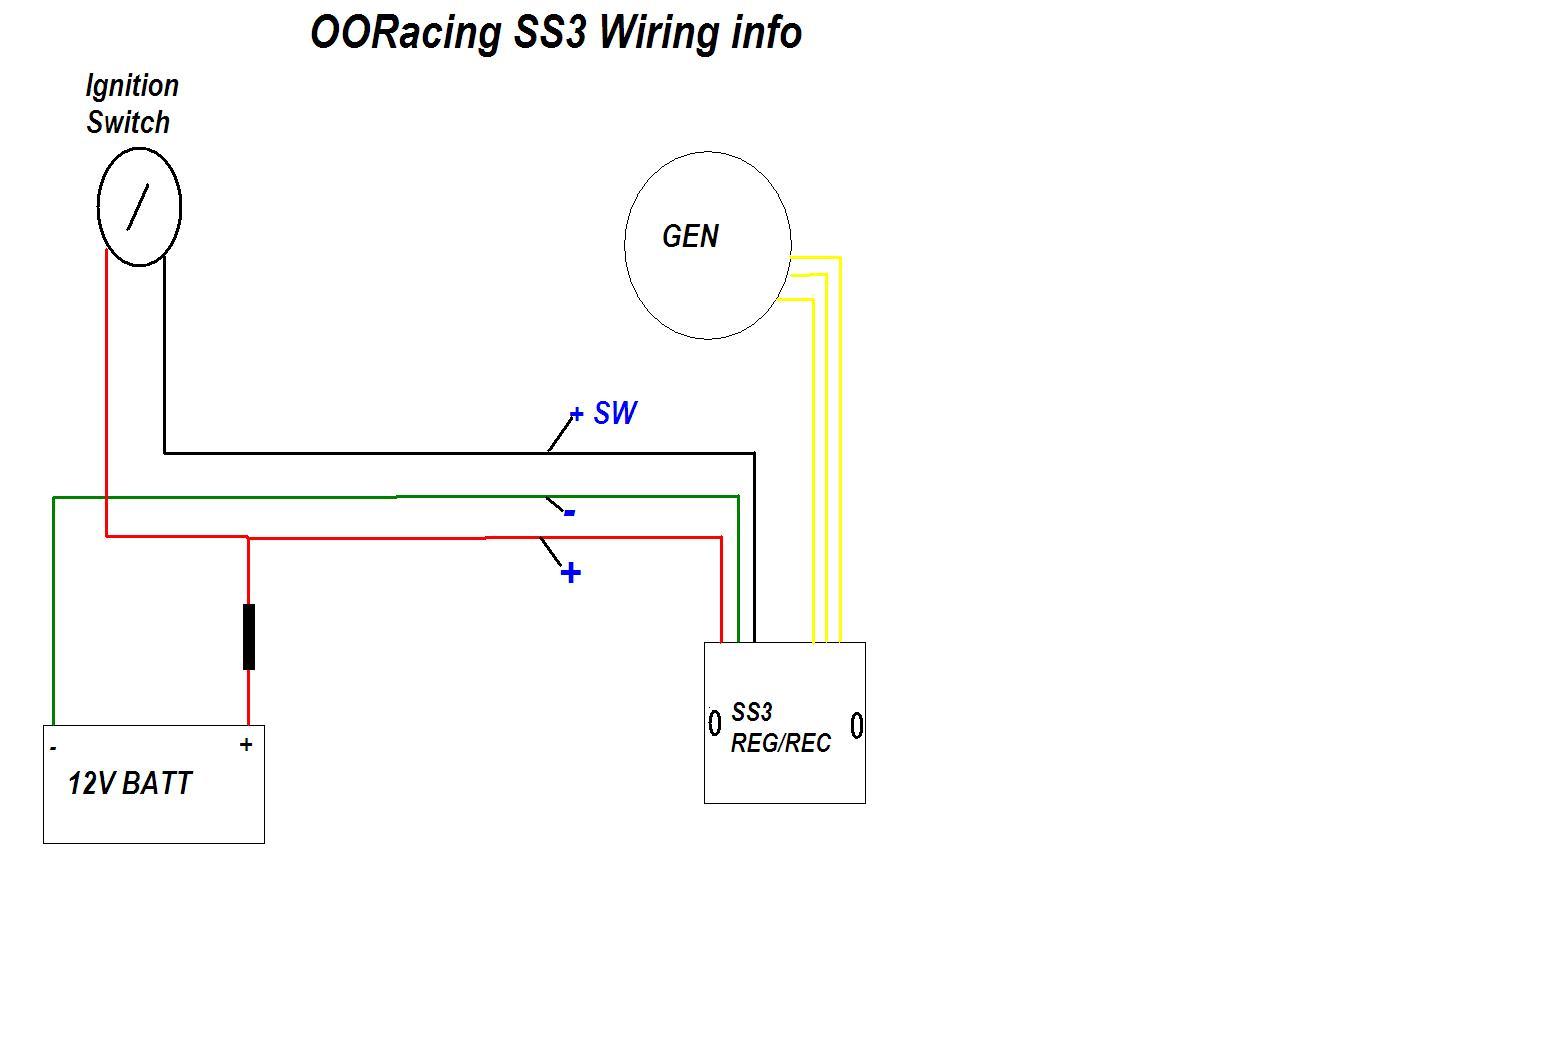 marvelous meerkat 50 wiring diagram gallery best image Yamaha Golf Cart Wiring Schematic Motorcycle Wiring Schematics